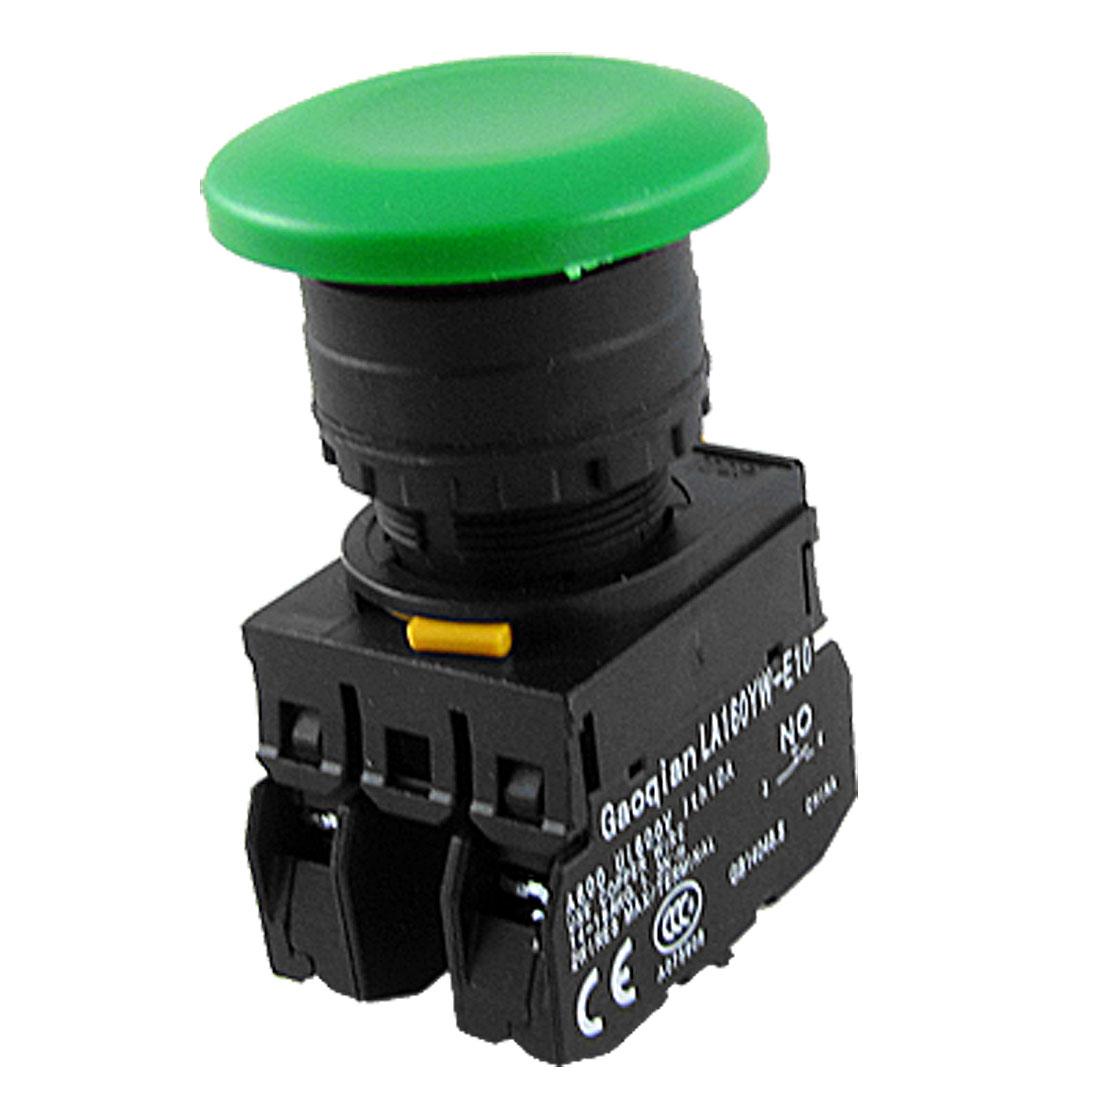 40mm Green Sign Momentary Mushroom Push Button Switch 1 NO 1 NC YW1B-M4E11PG